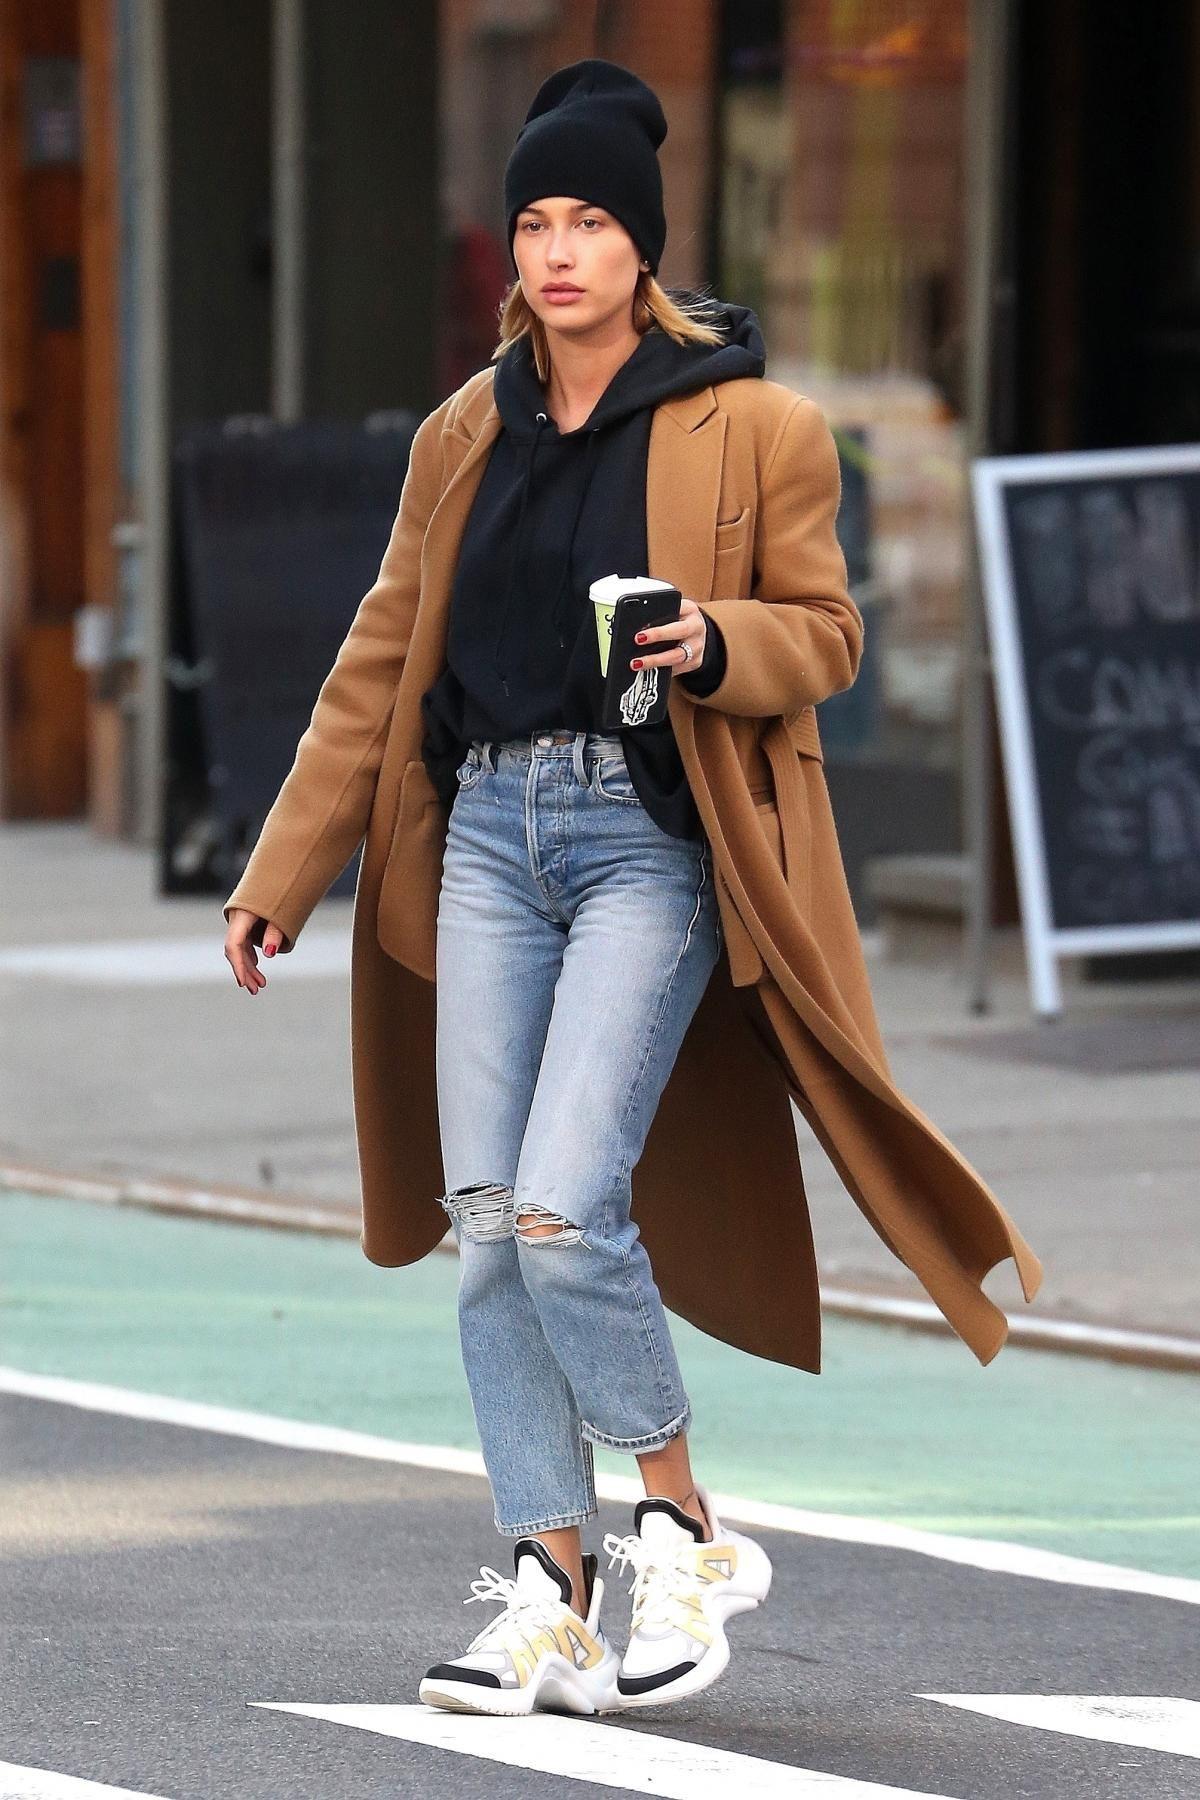 Hailey Bieber Wearing brown coat